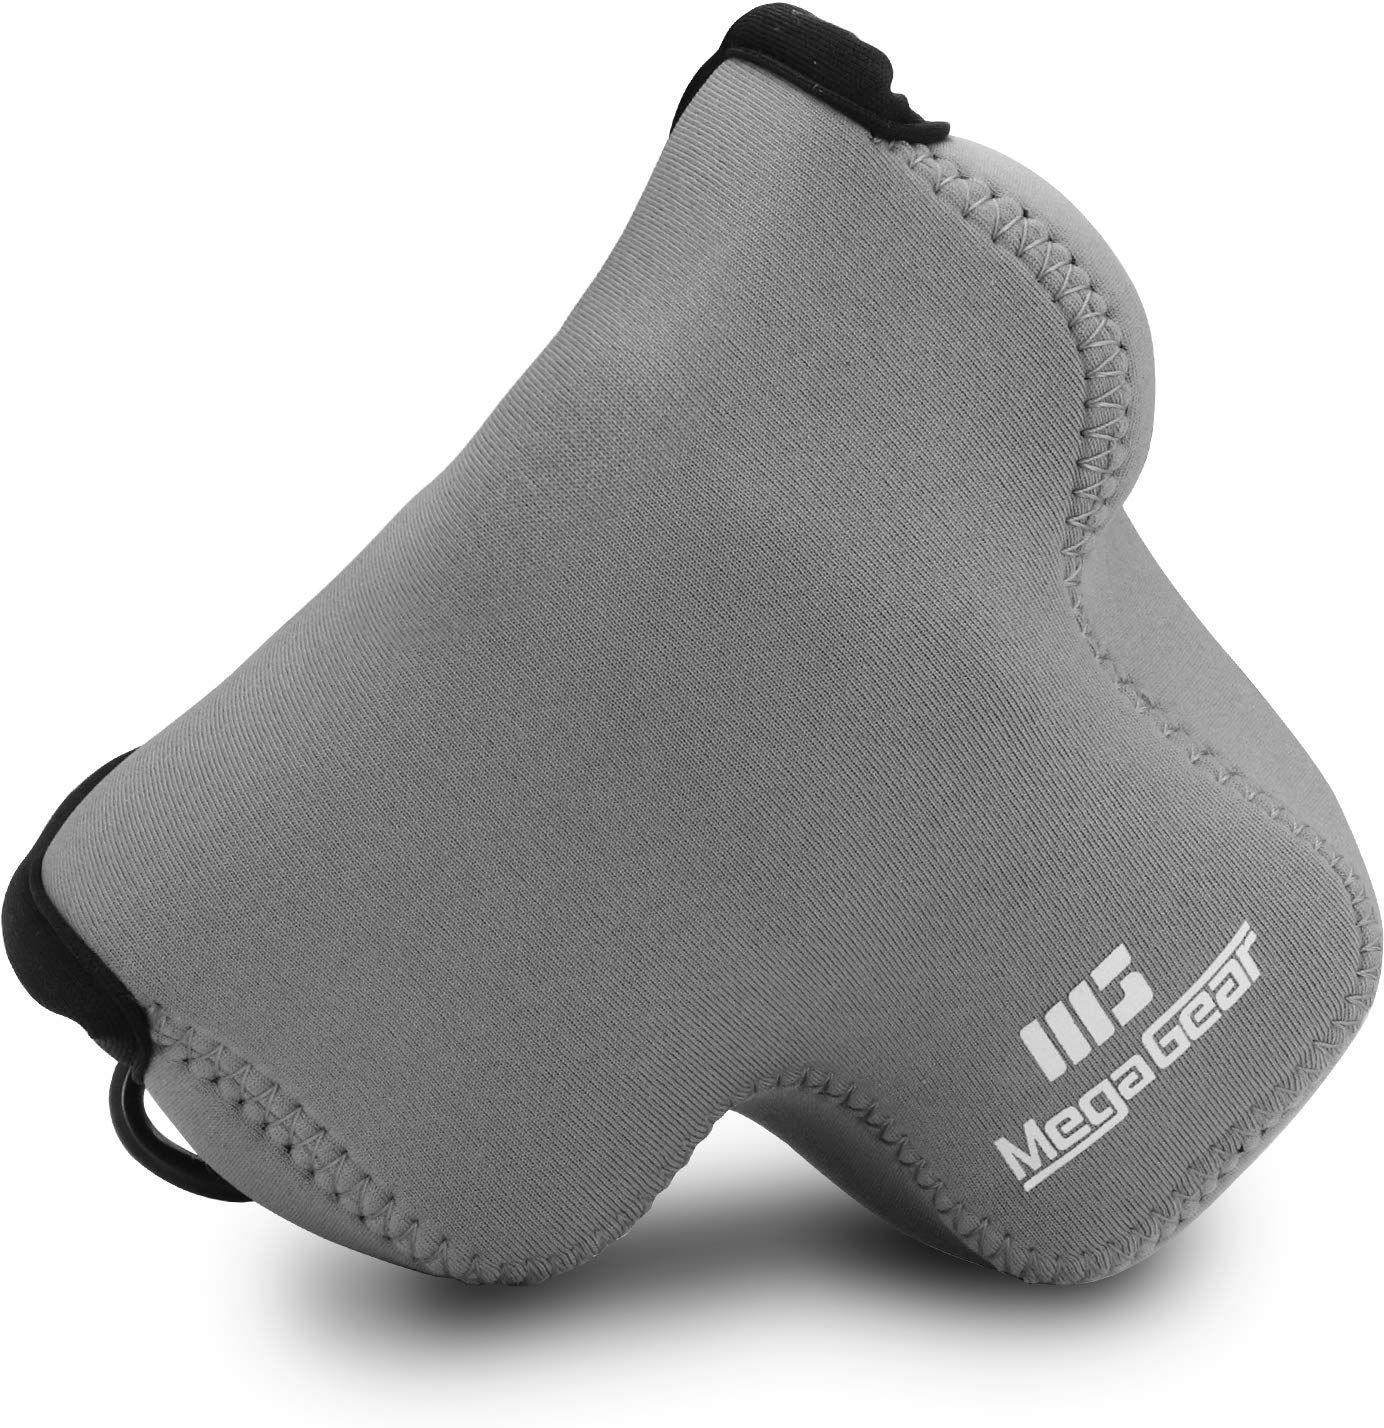 MegaGear MG1037 Canon EOS M50, M5 (15-45) ultralekka torba na aparat z neoprenu - szara